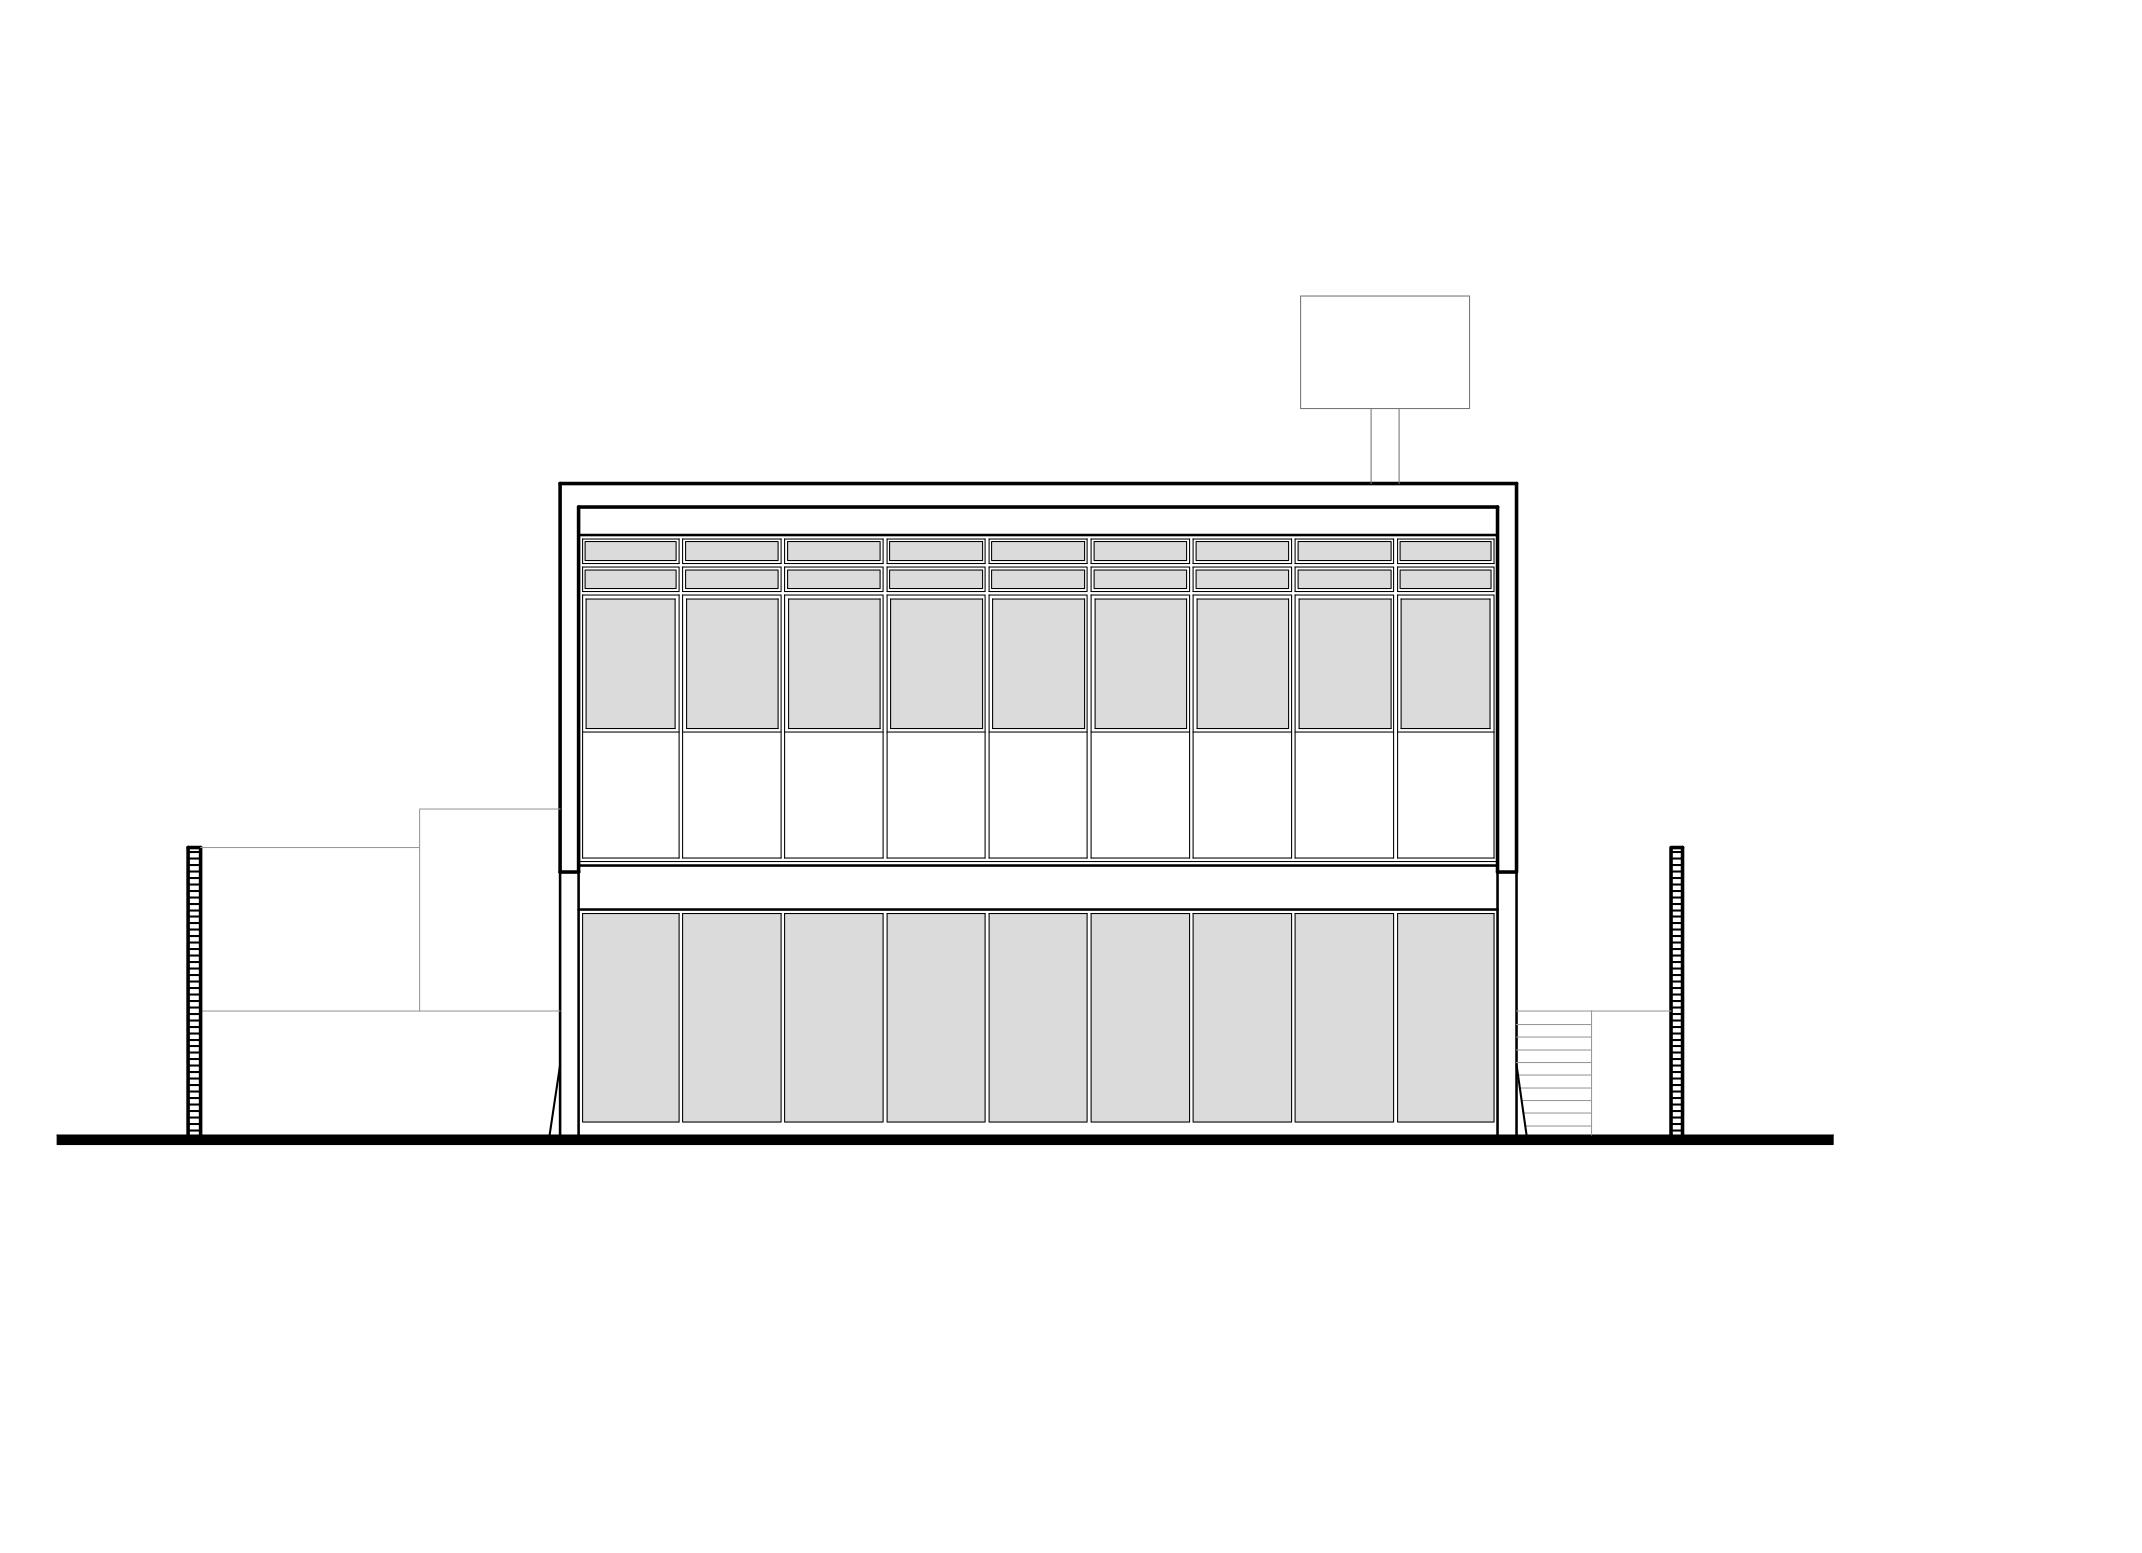 residência_taques_bittencourt_II_(33).jpg